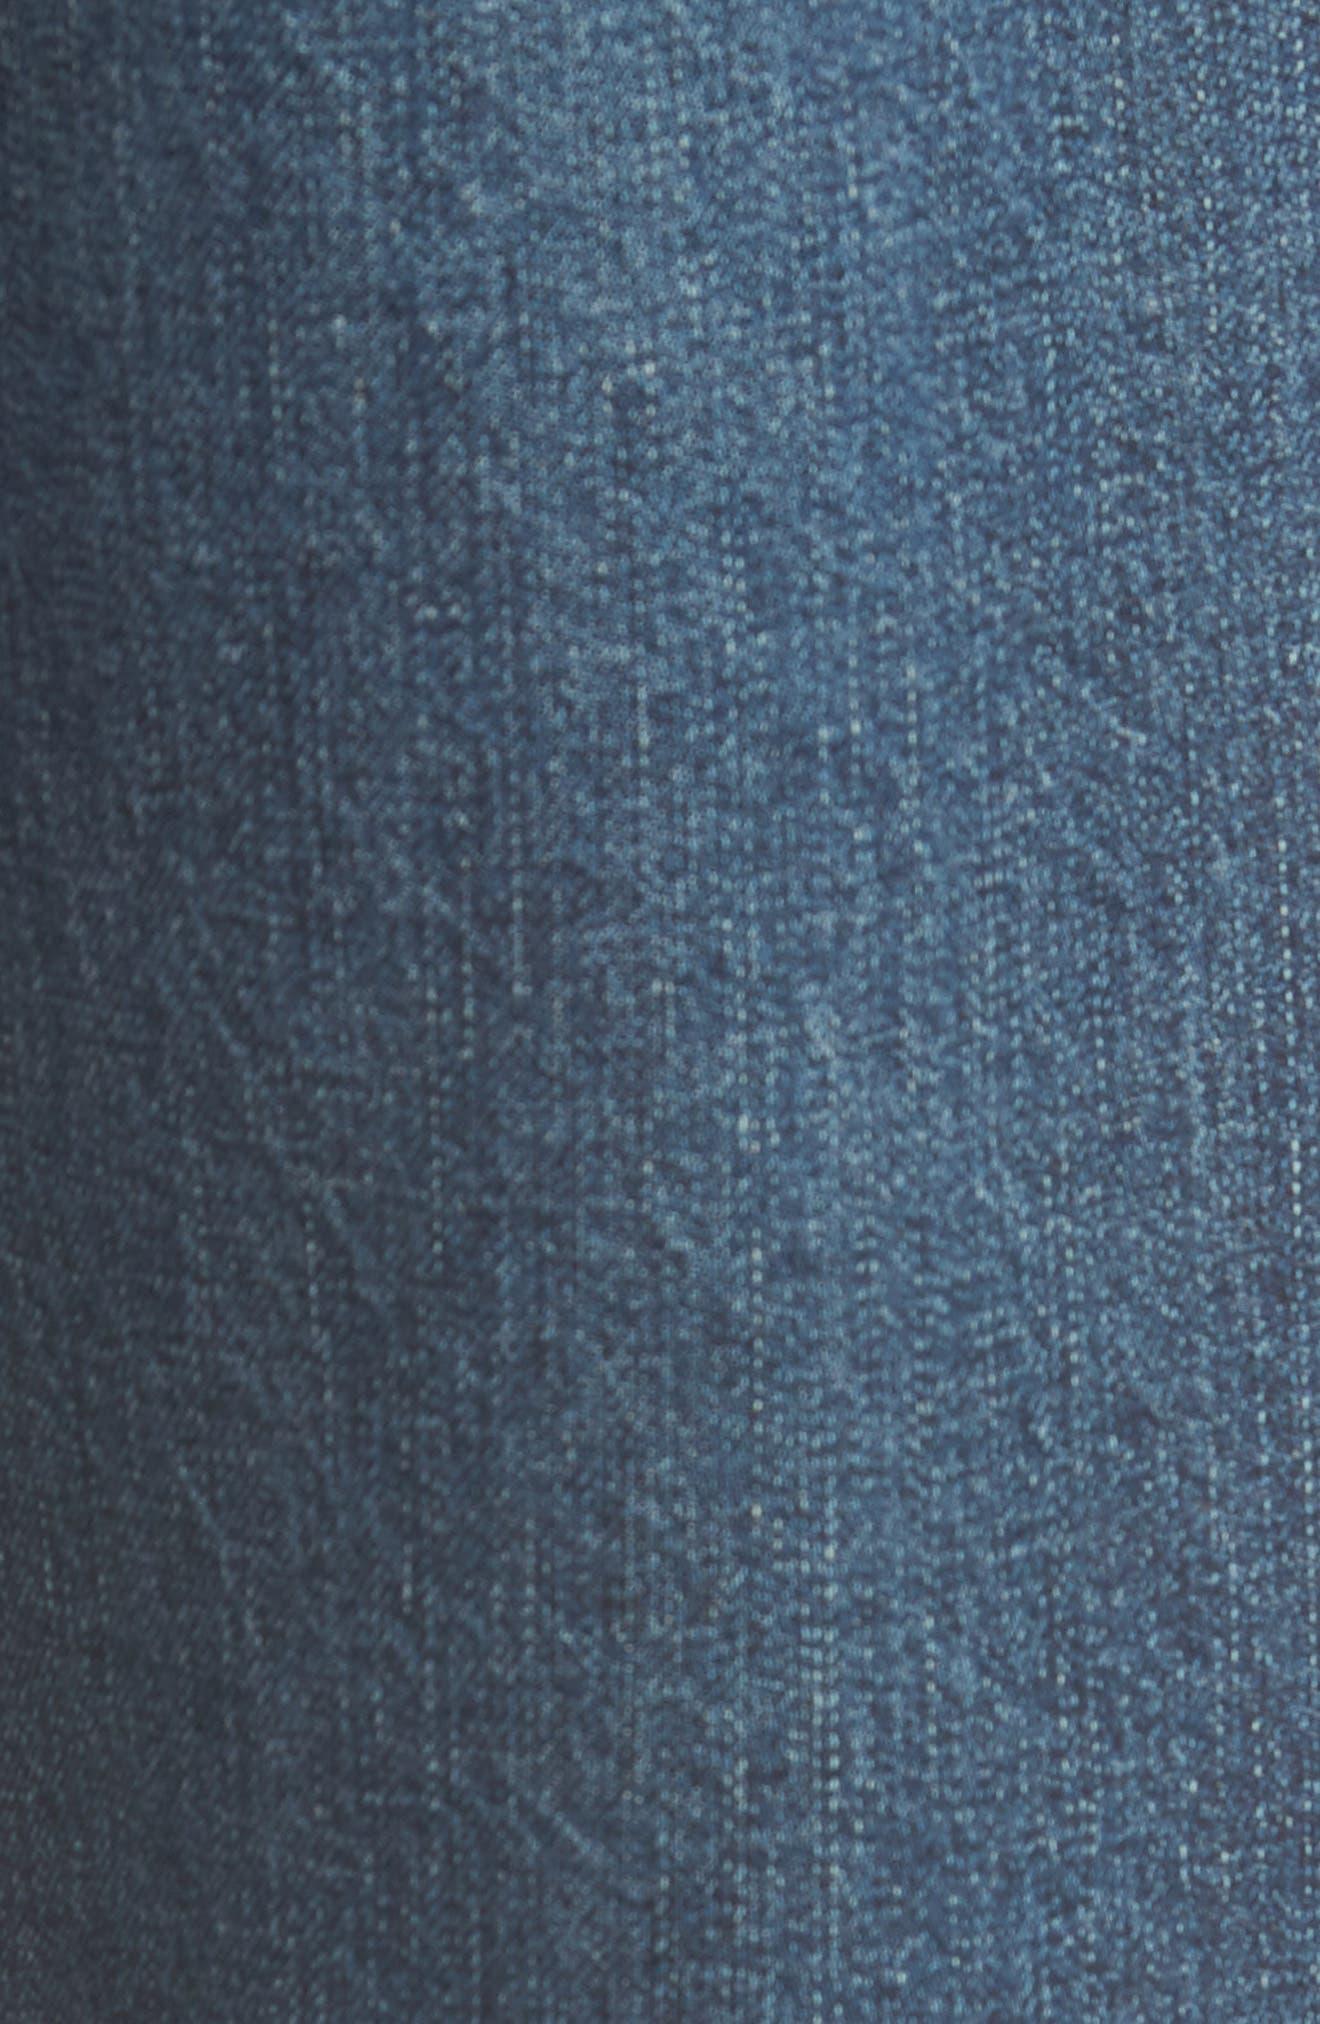 Turner Crop Jeans,                             Alternate thumbnail 5, color,                             5 YEARS WAYFARER